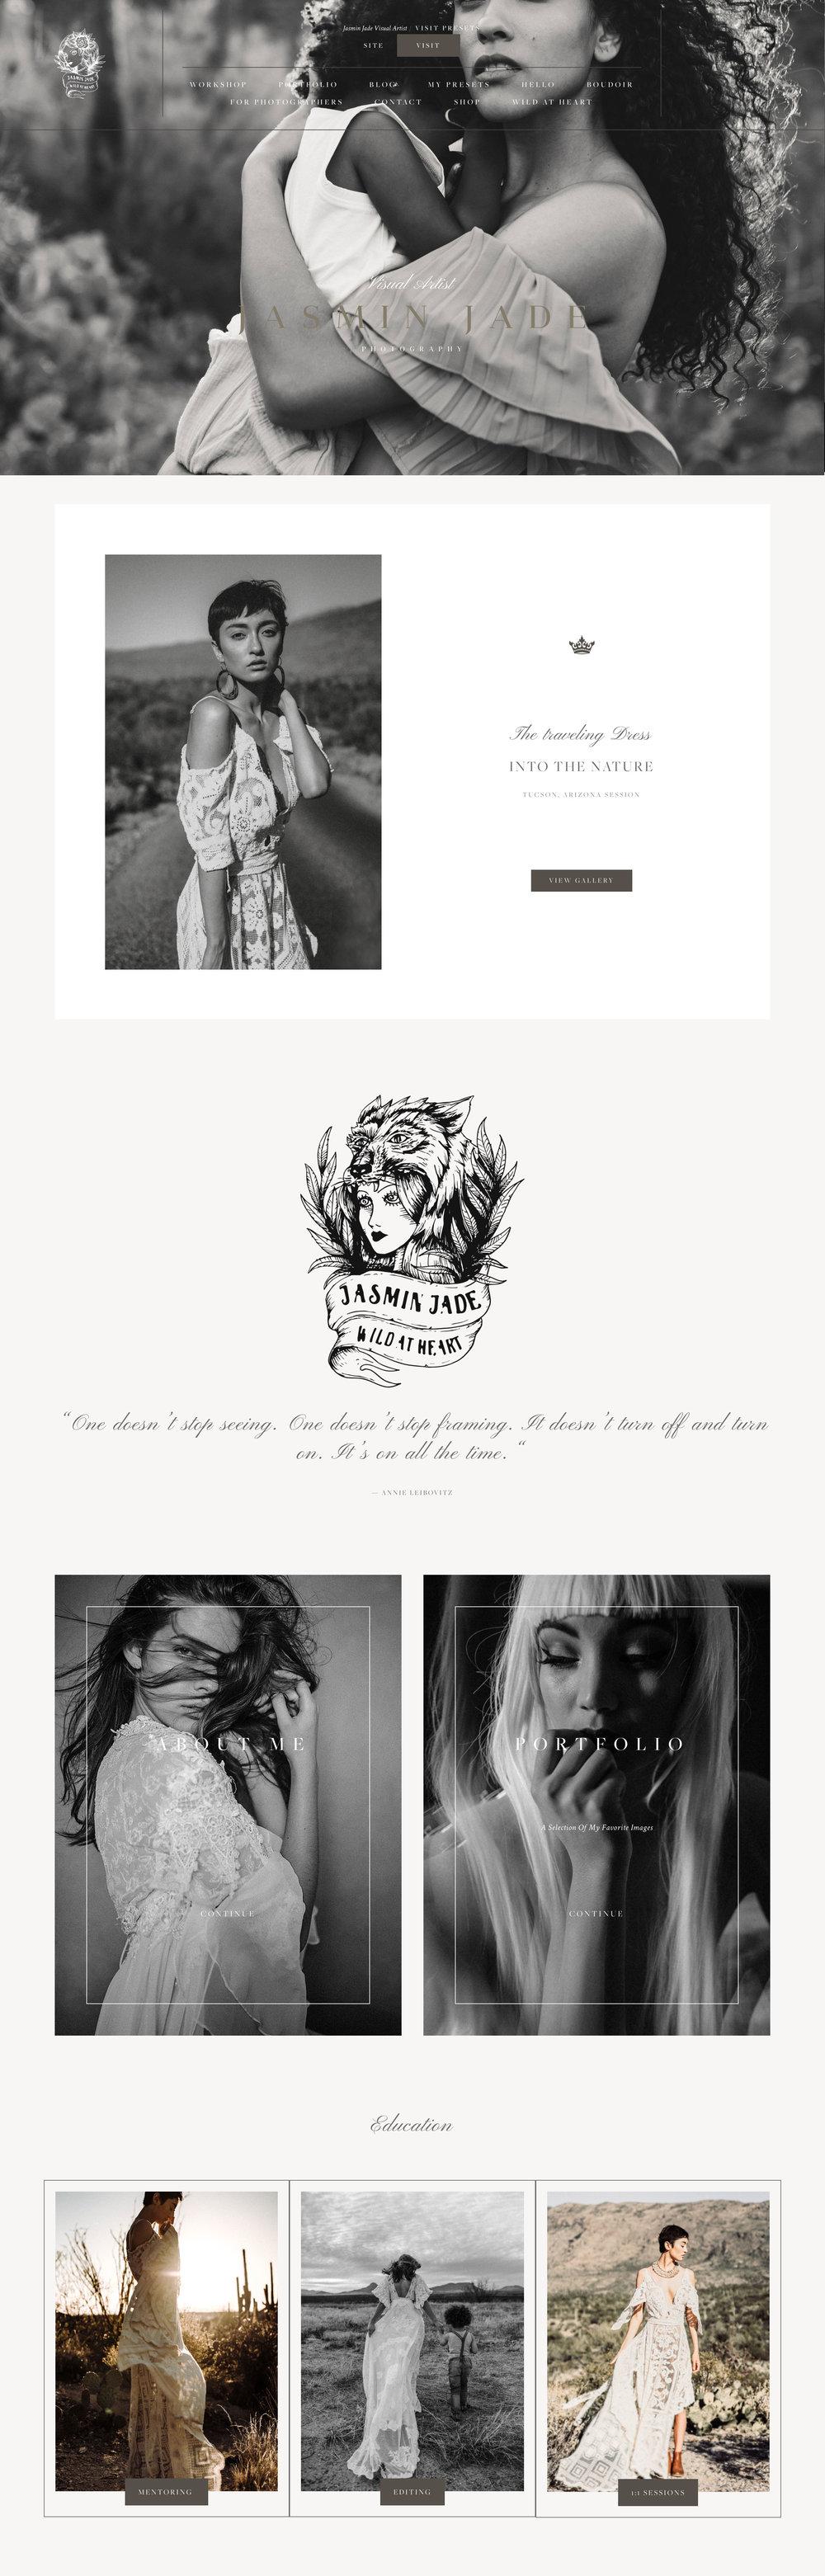 jasminjade-photography-website.jpg